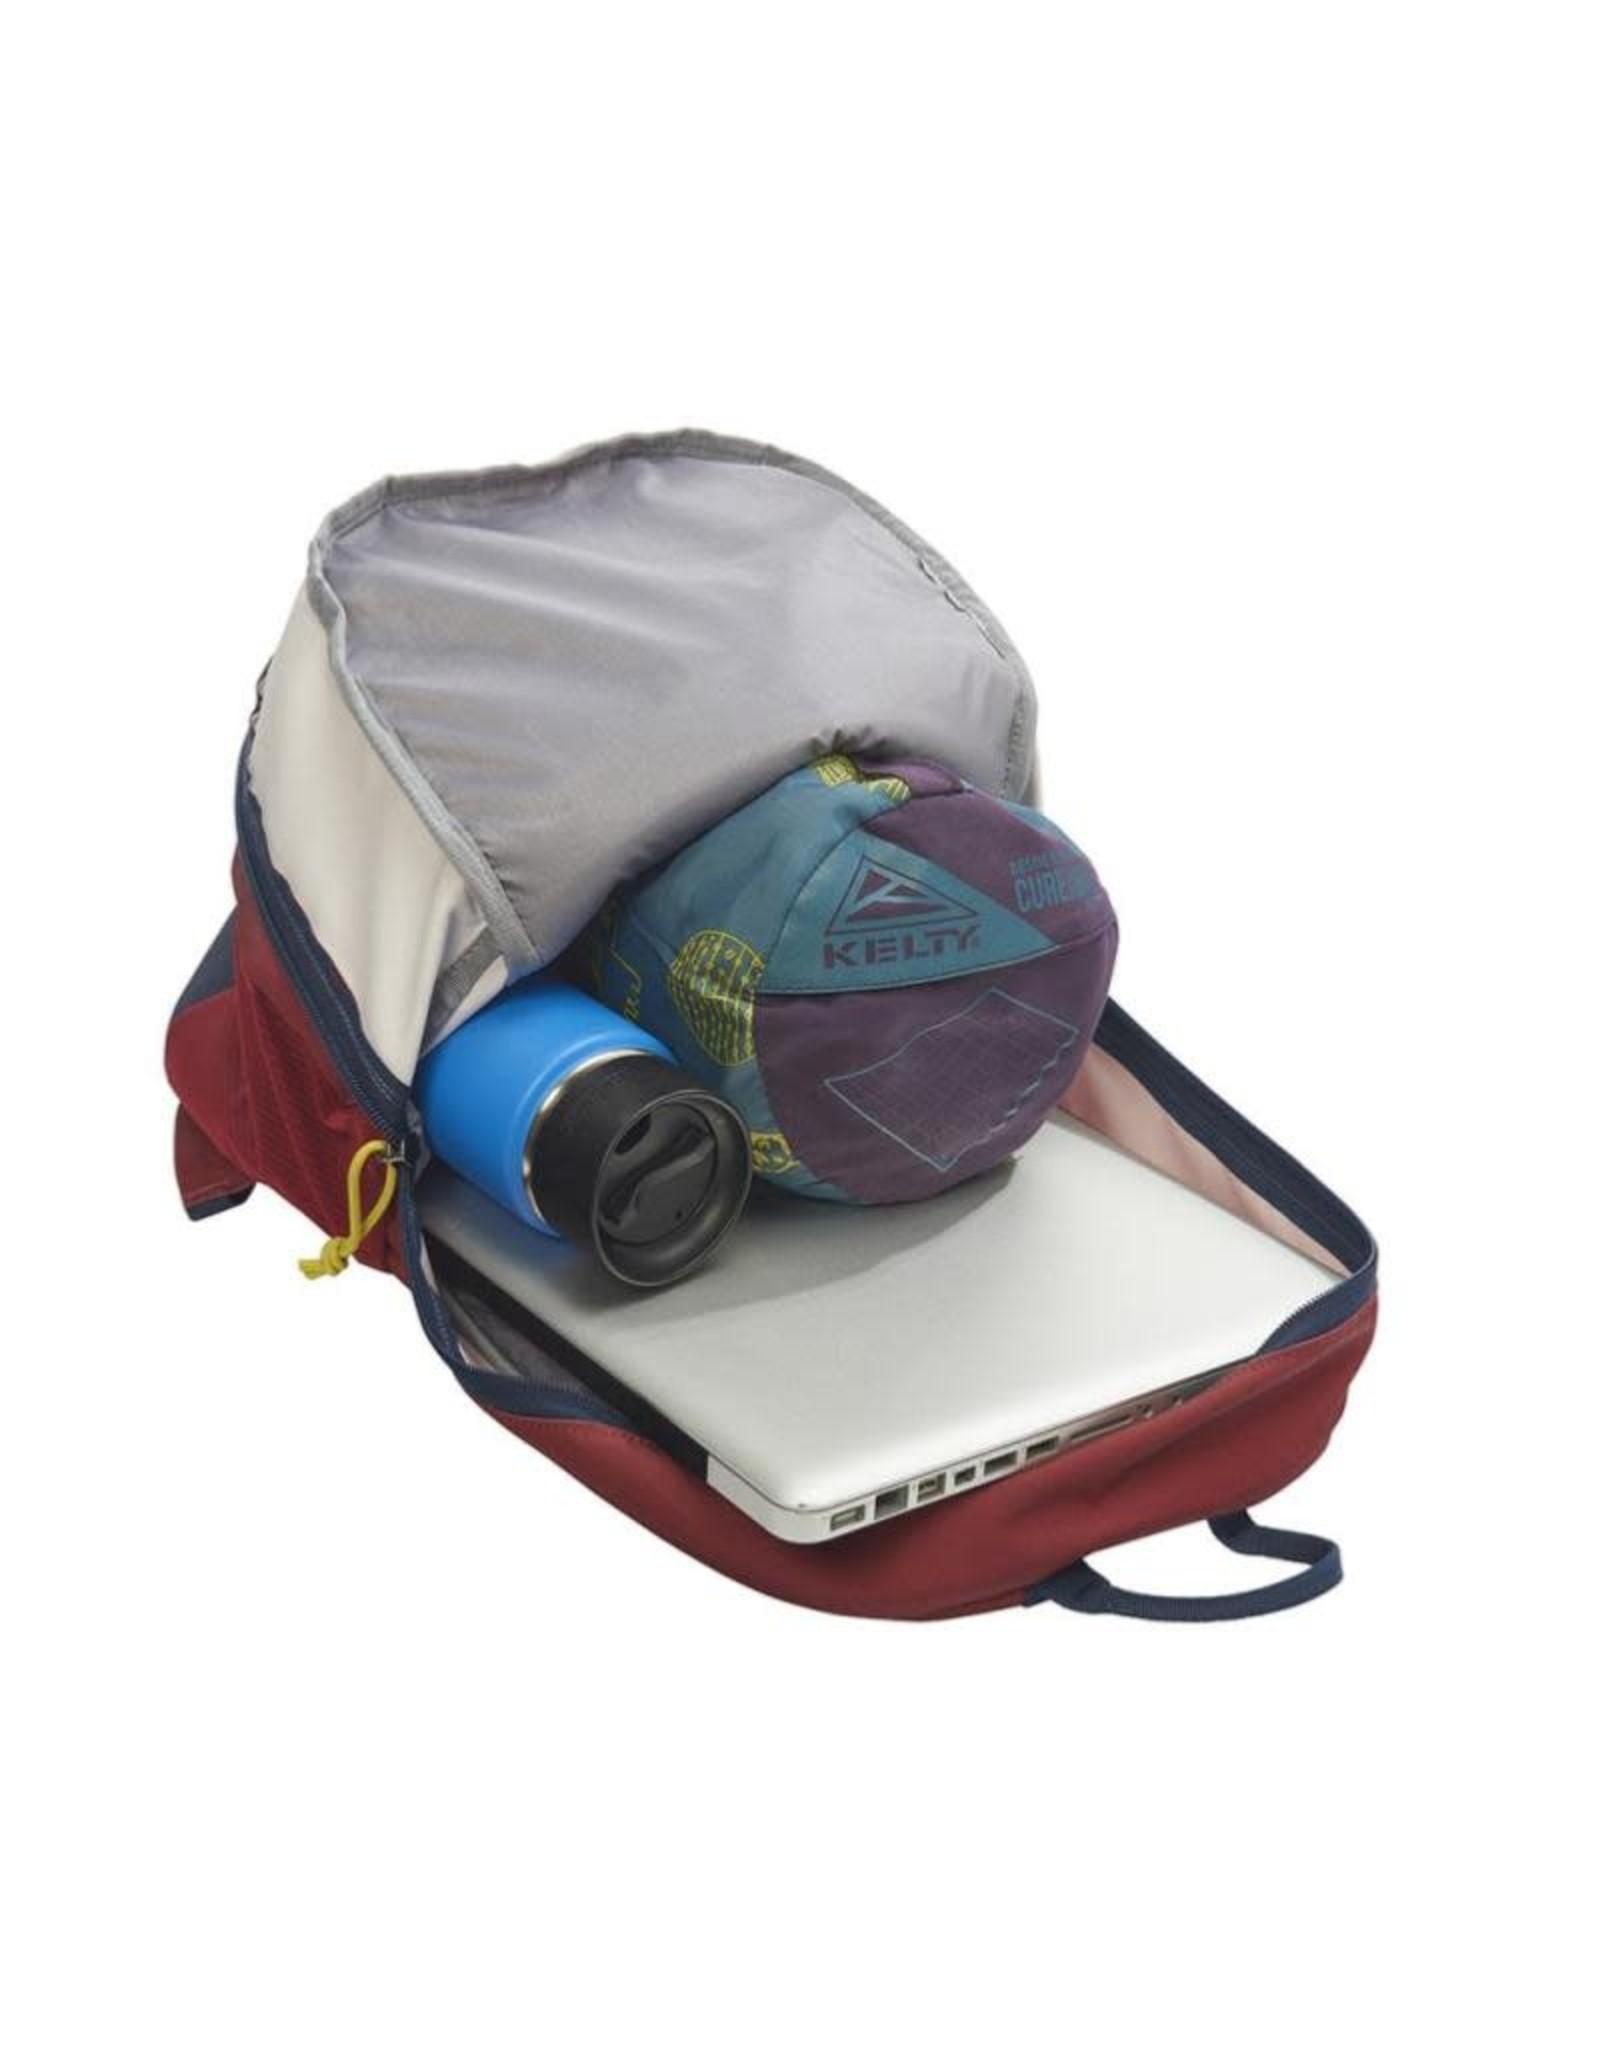 Kelty Quartz 26L Pack